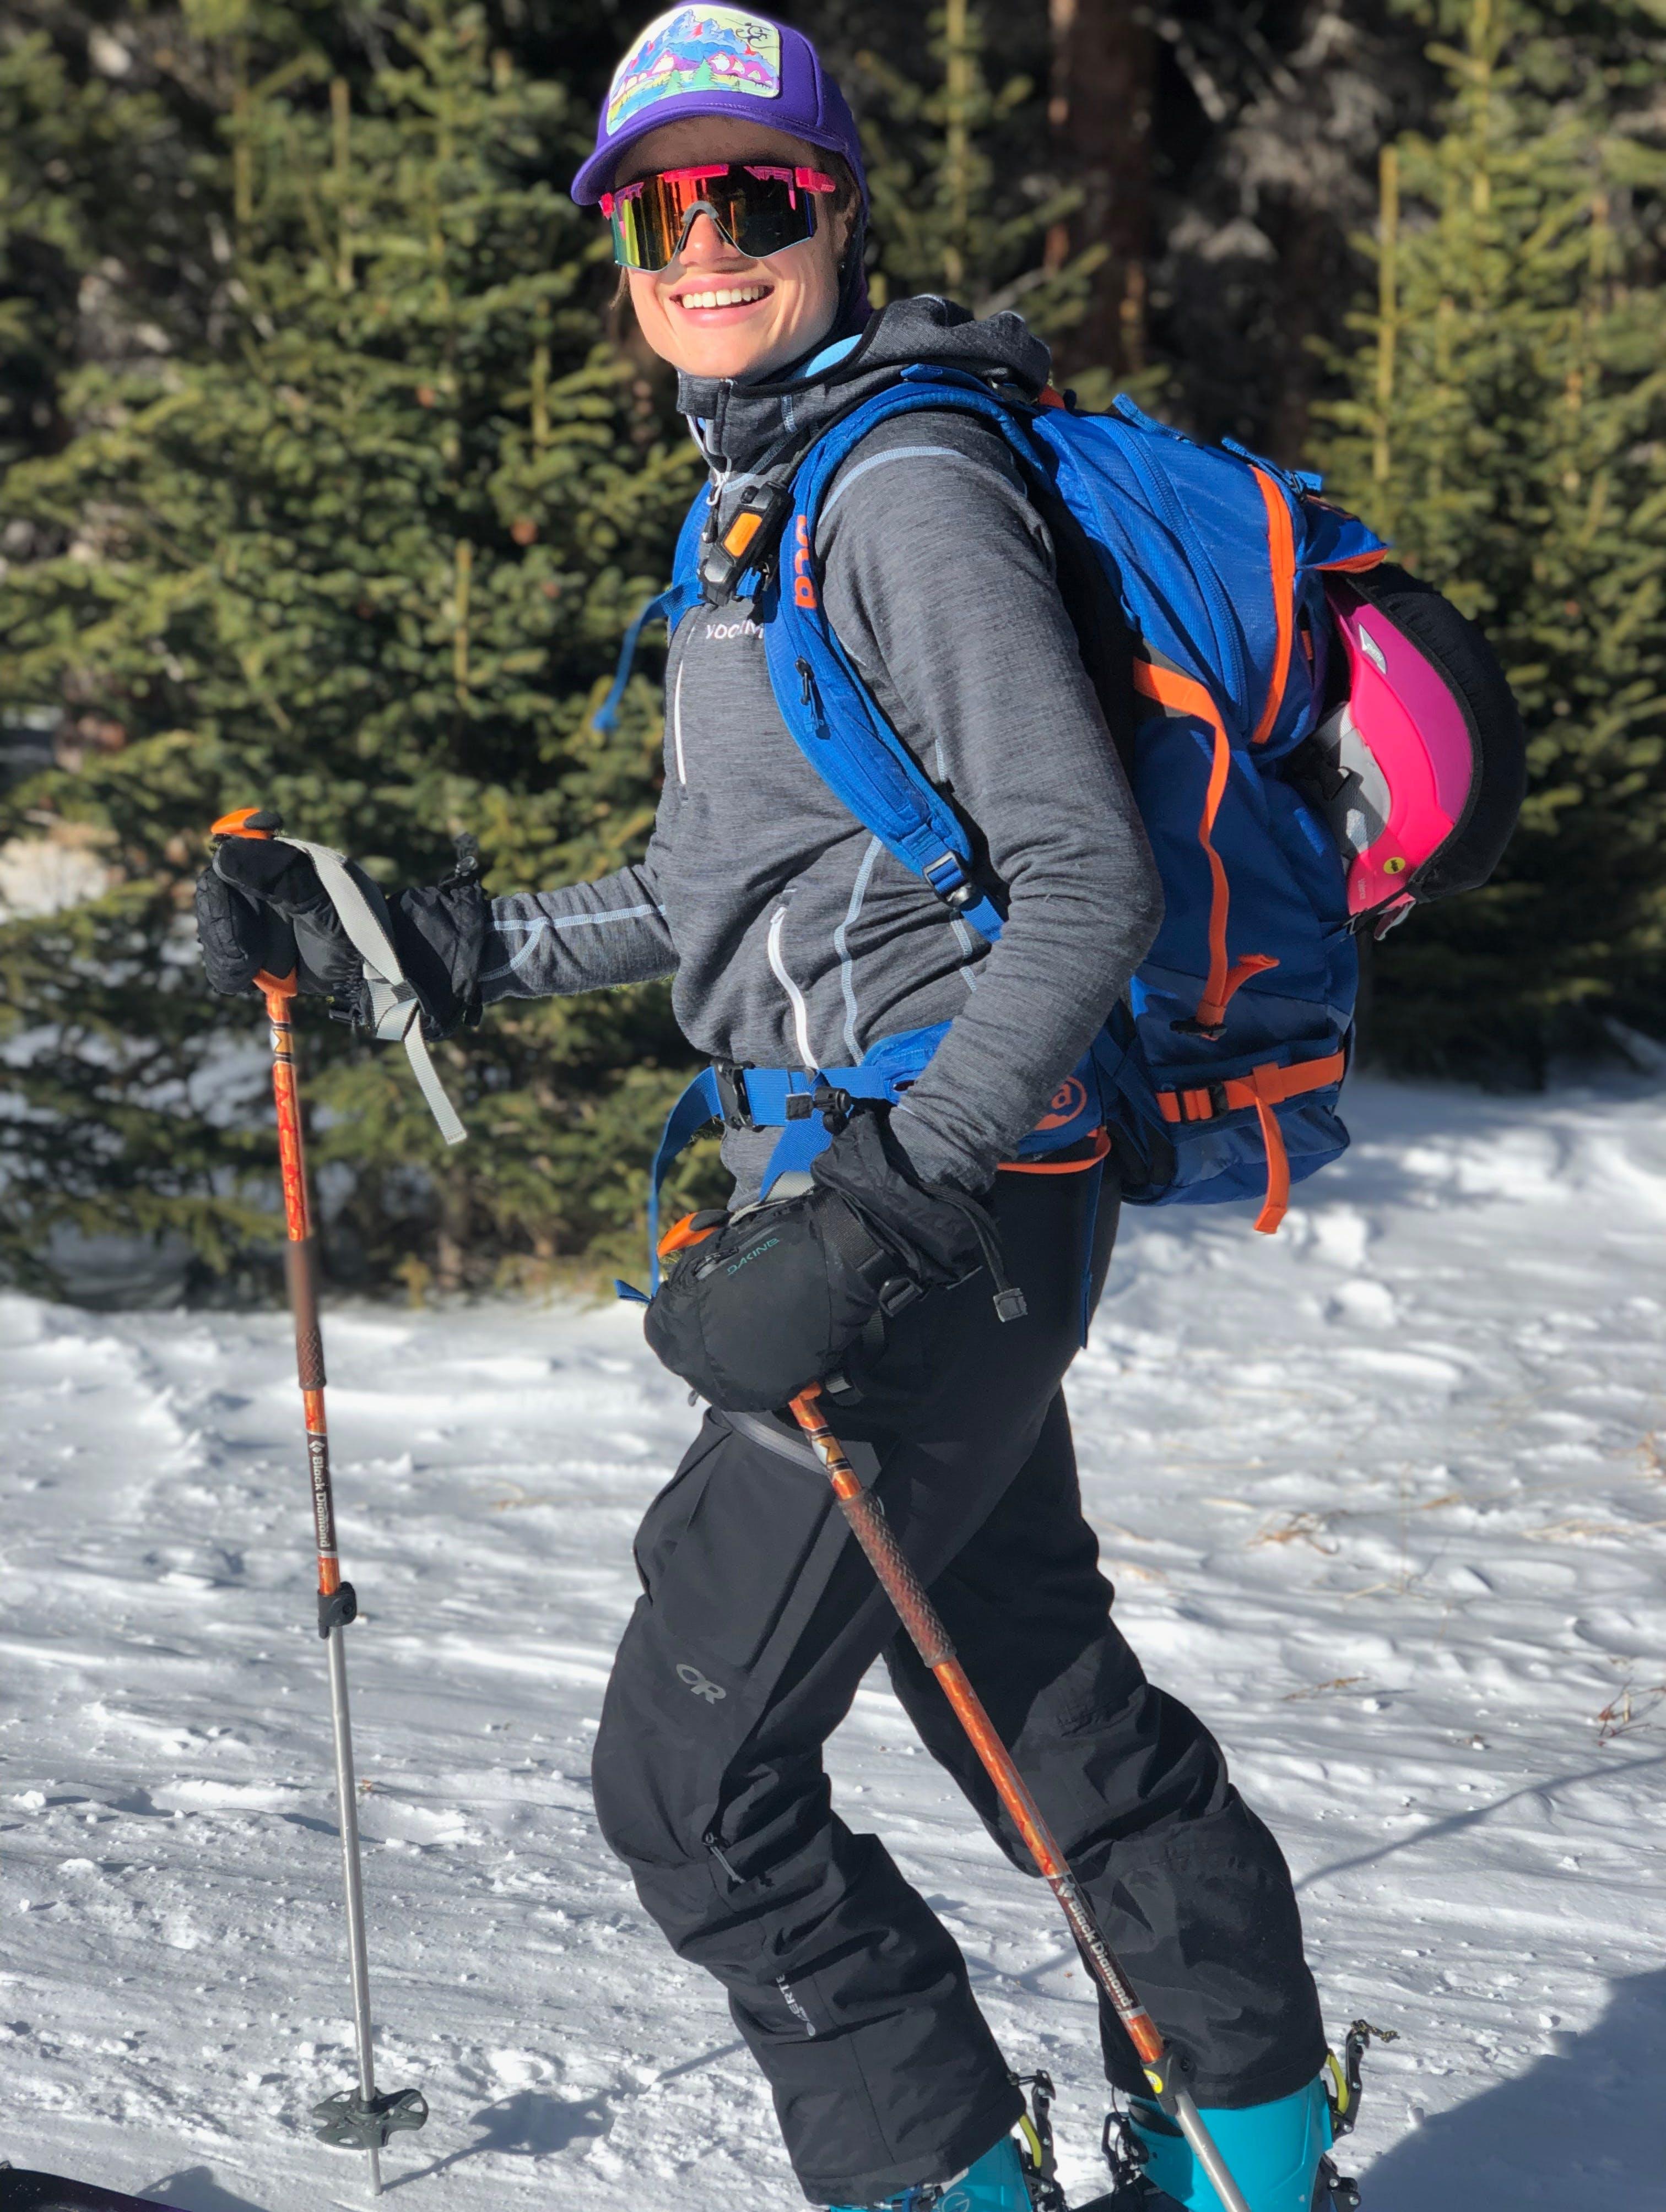 Winter Sports Expert Kelly Greene